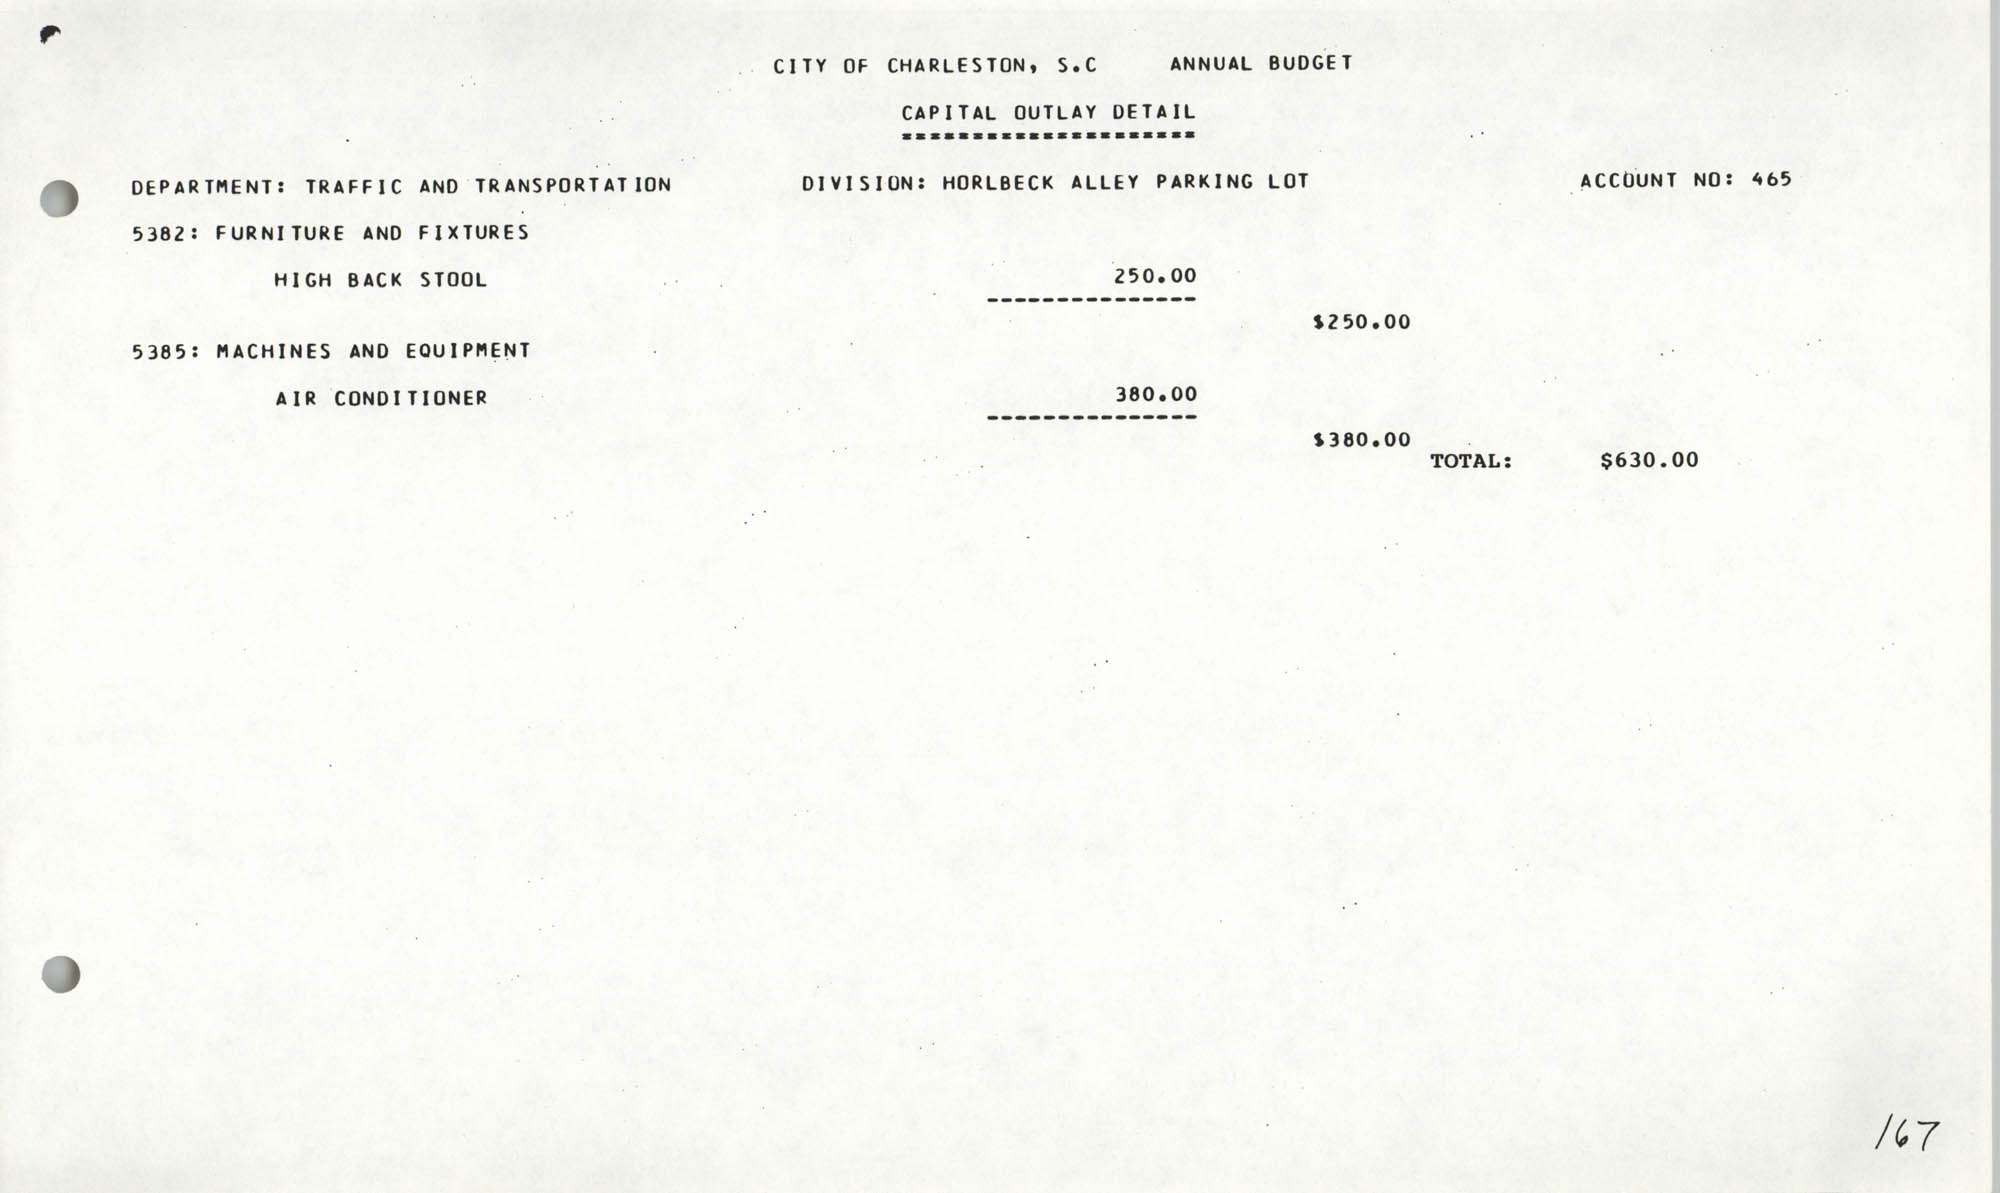 The City Council of Charleston, South Carolina, 1993 Budget, Page 167